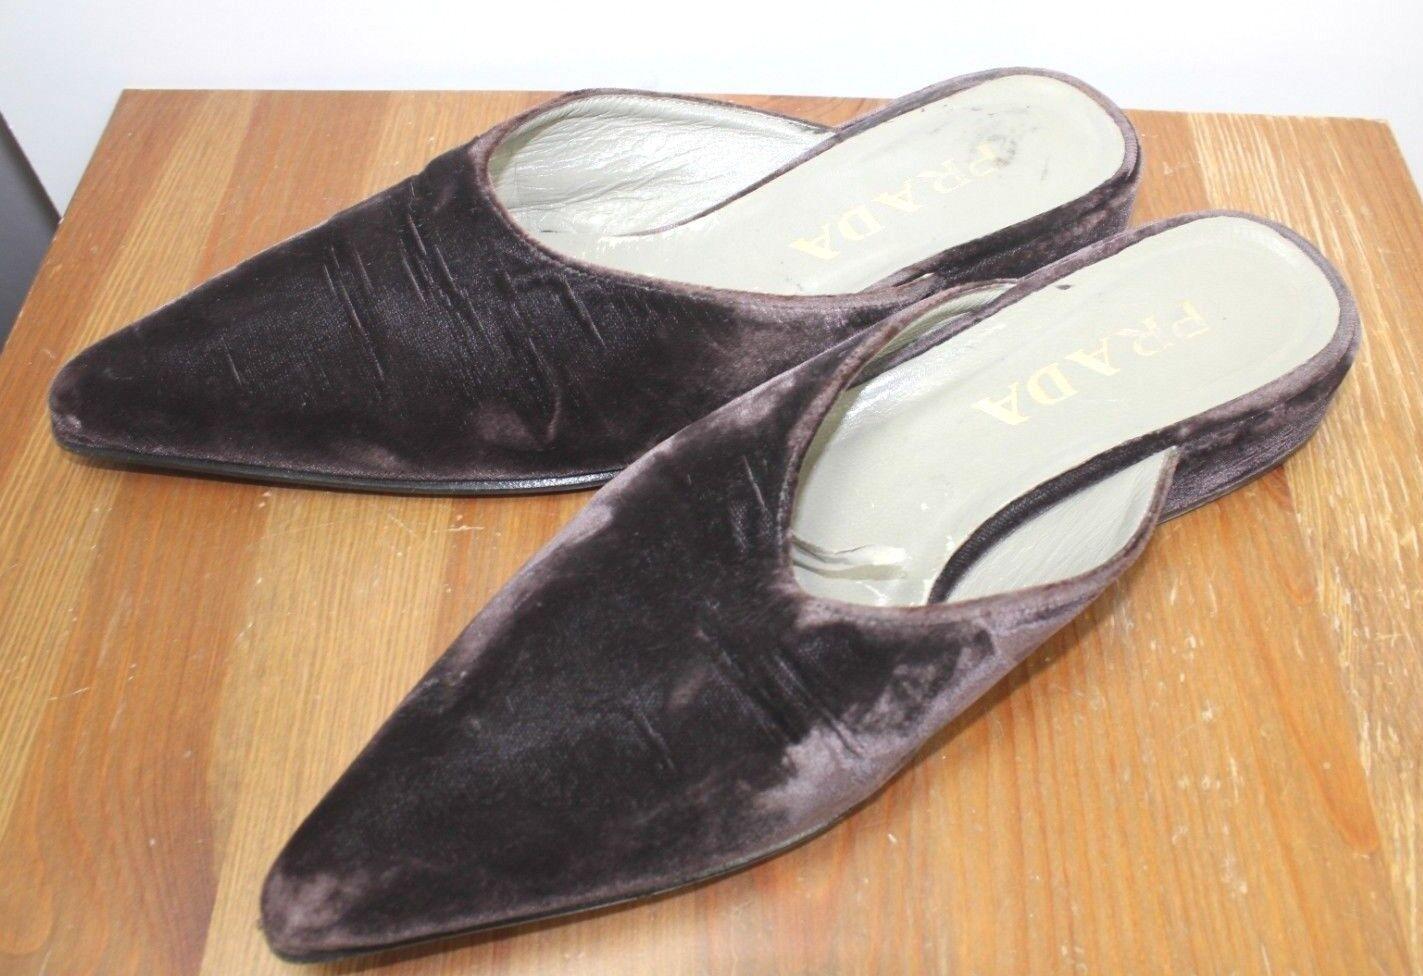 damen damen damen Prada Heels Suede Leather lila Pointed EU 37.5 UK 4.5 Court schuhe 220635